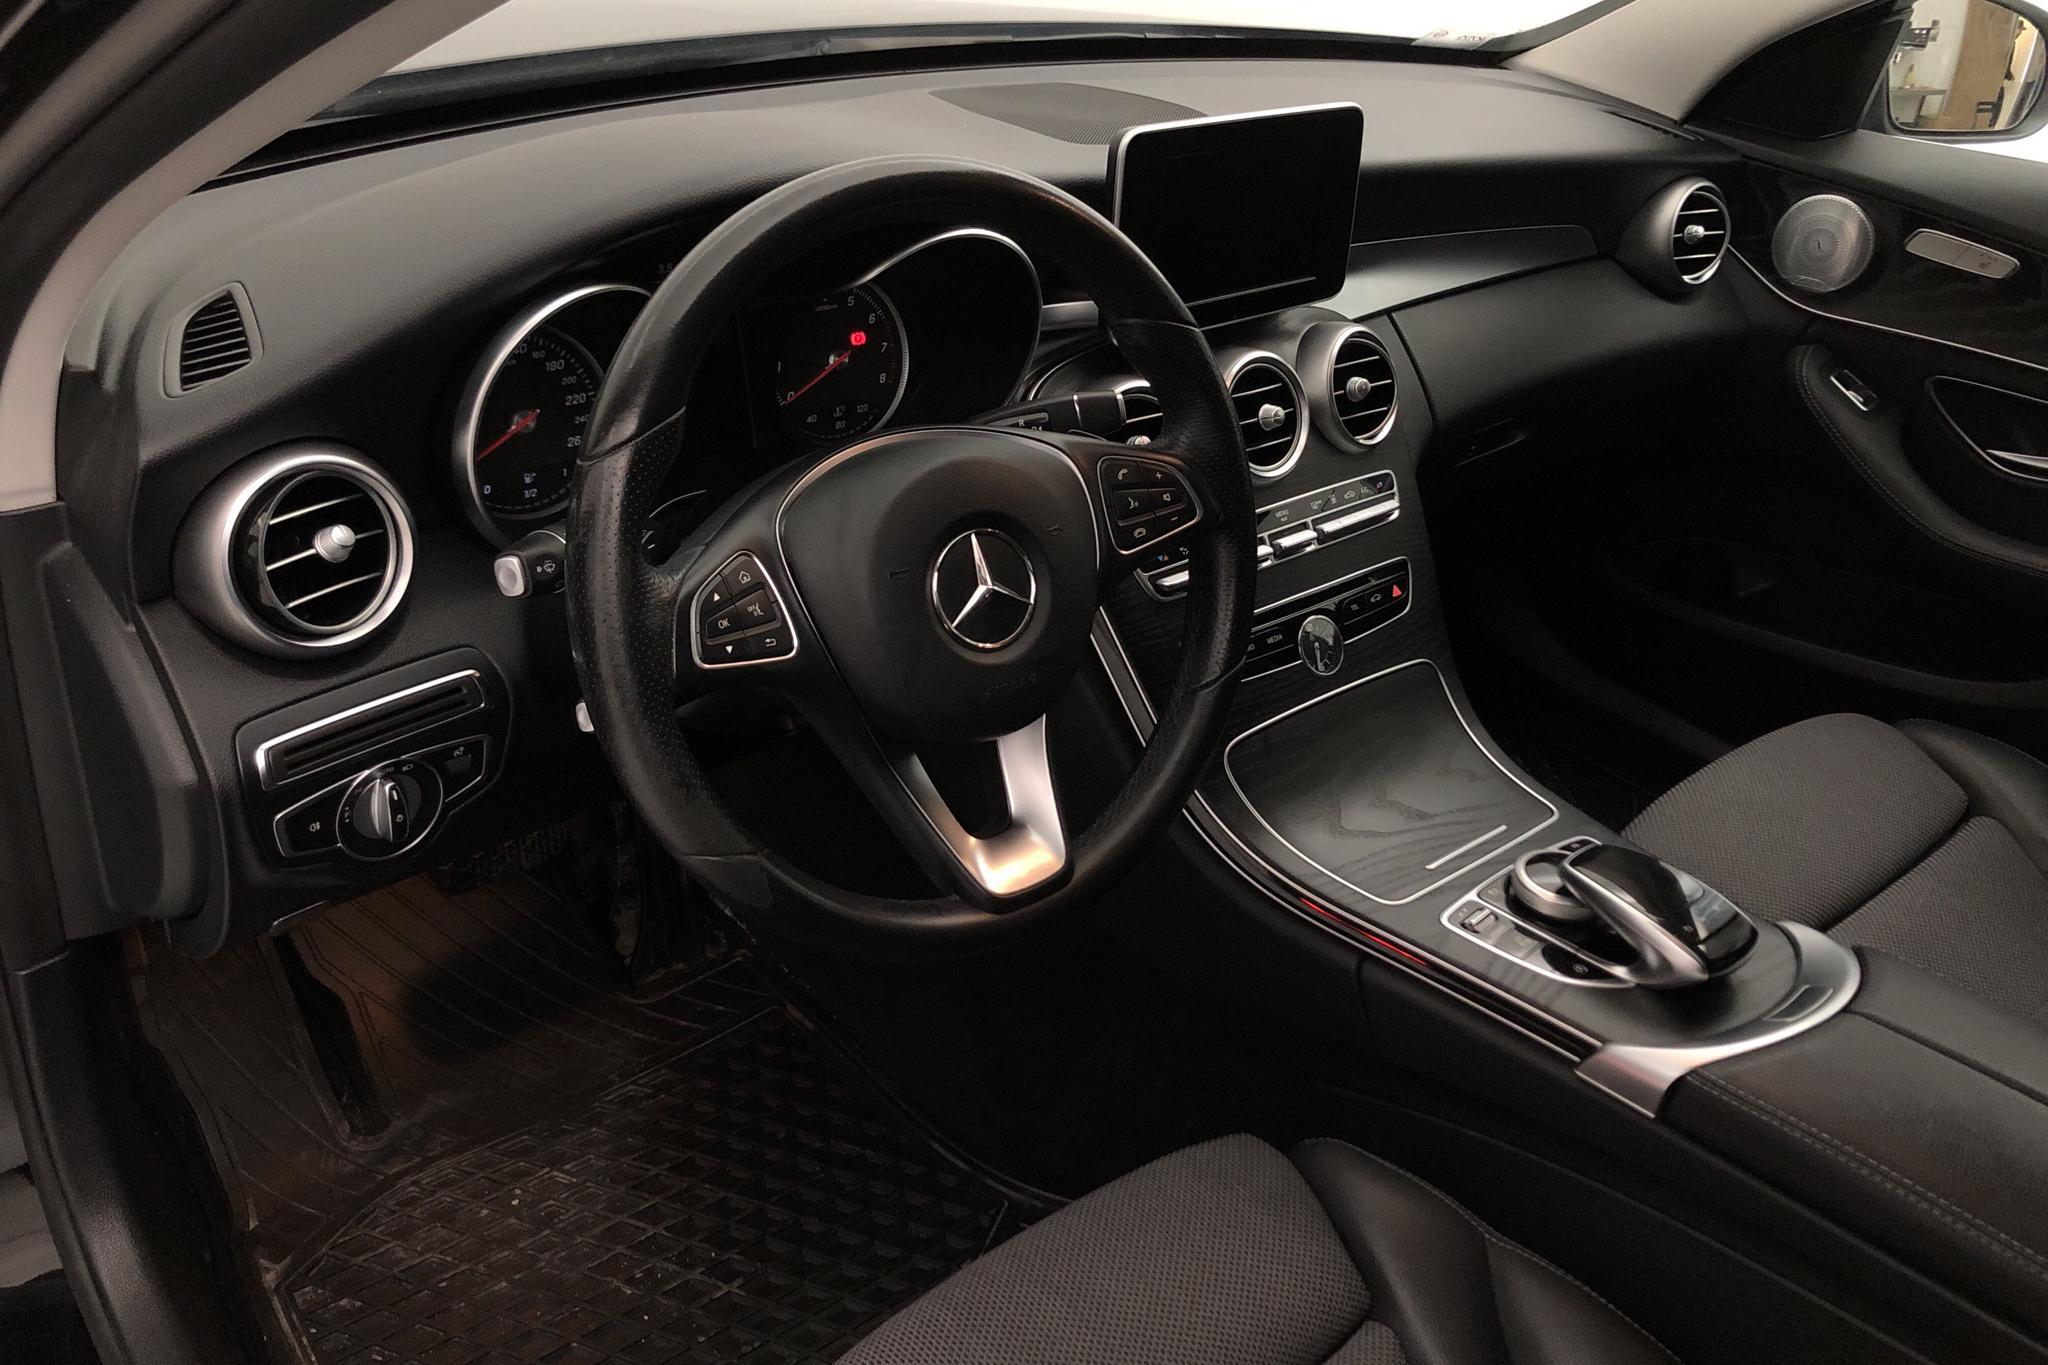 Mercedes C 200 4MATIC Kombi S205 (184hk) - 112 620 km - Automatic - black - 2018